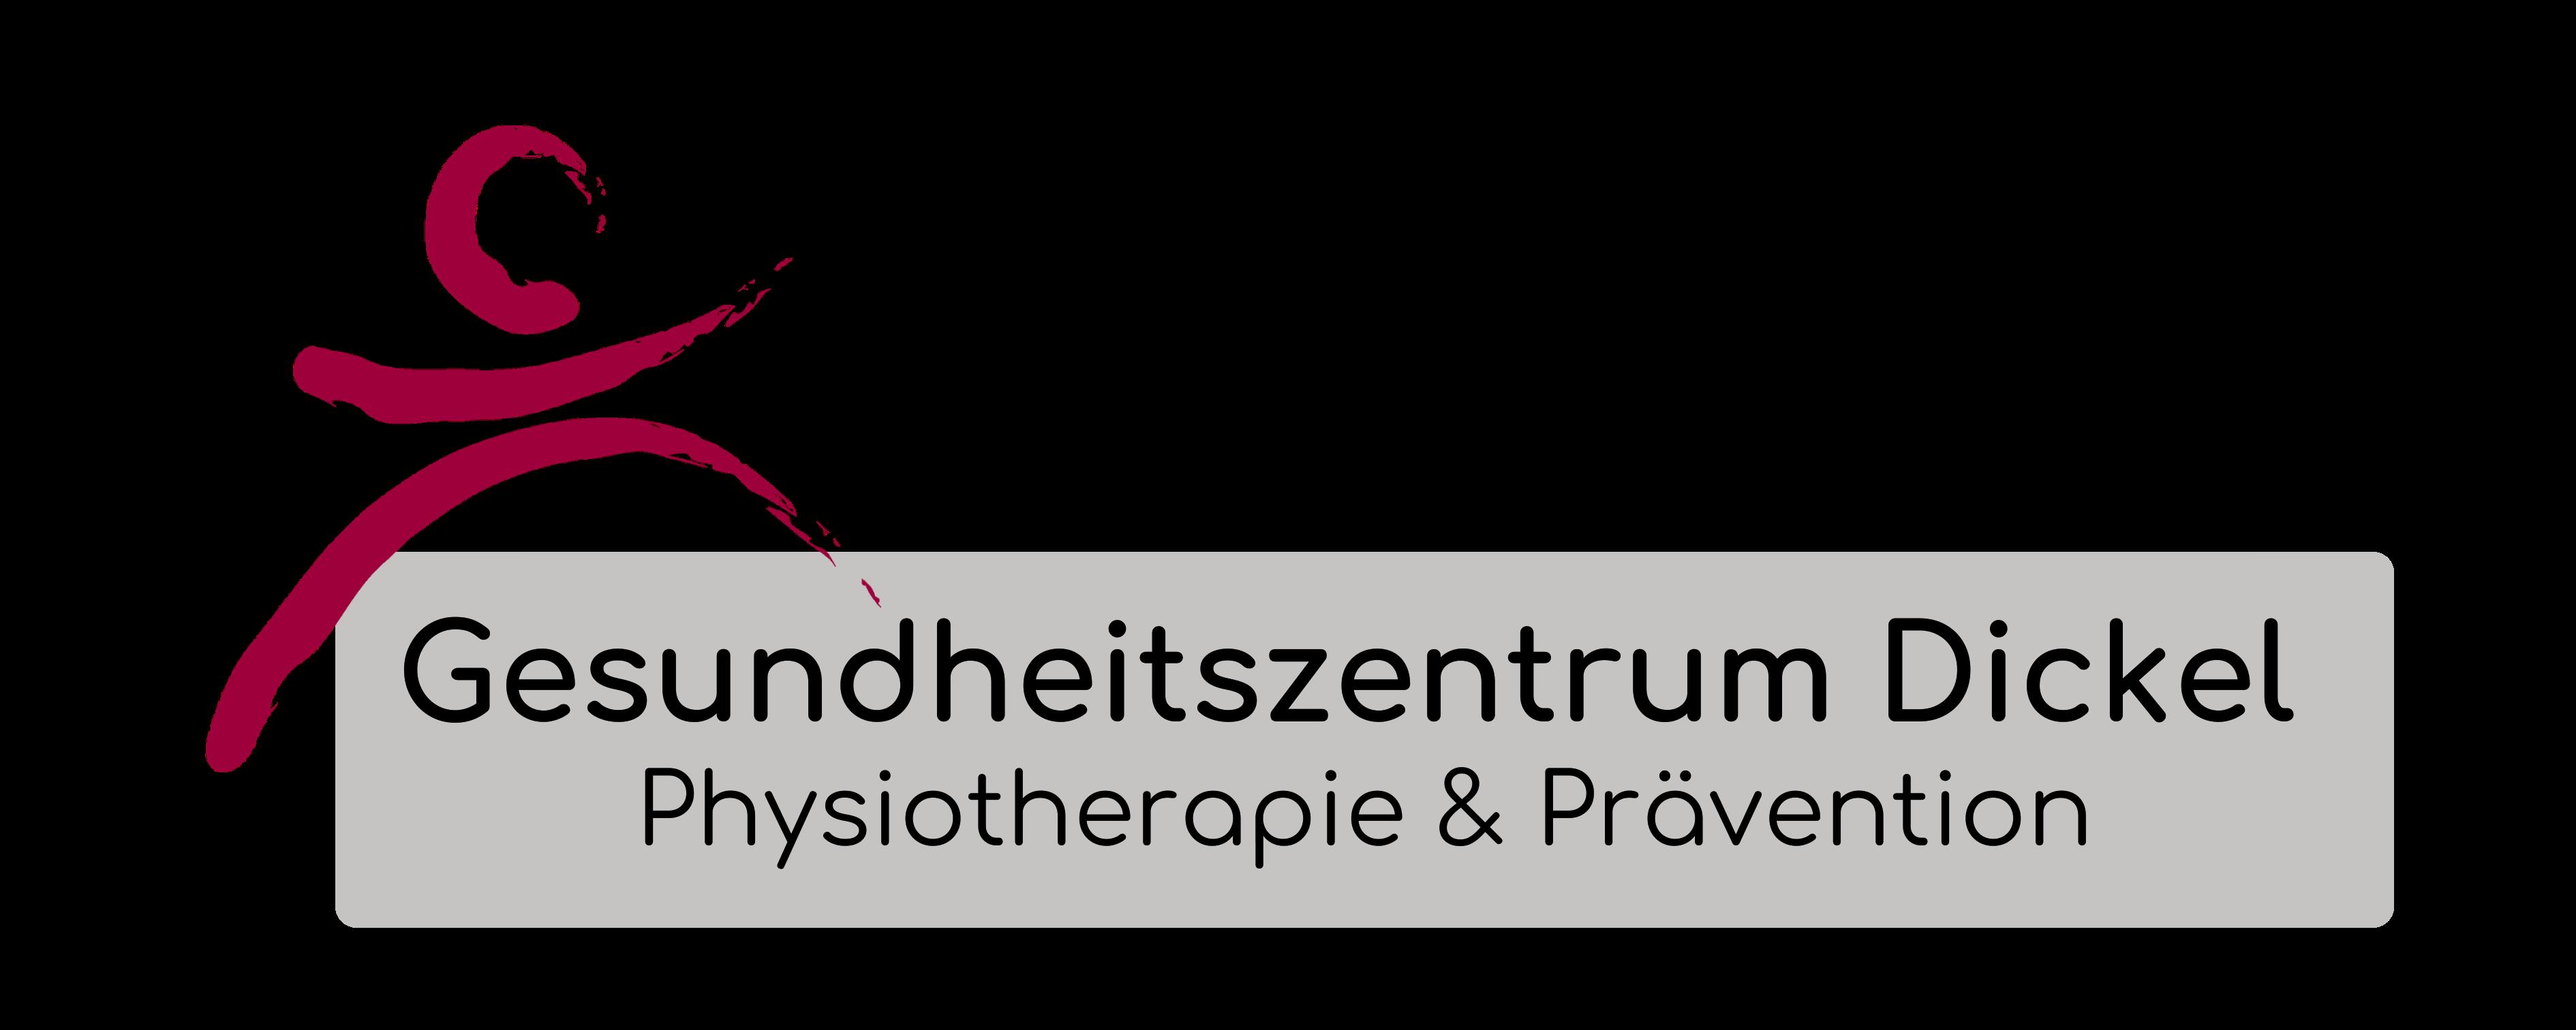 Gesundheitszentrum Dickel